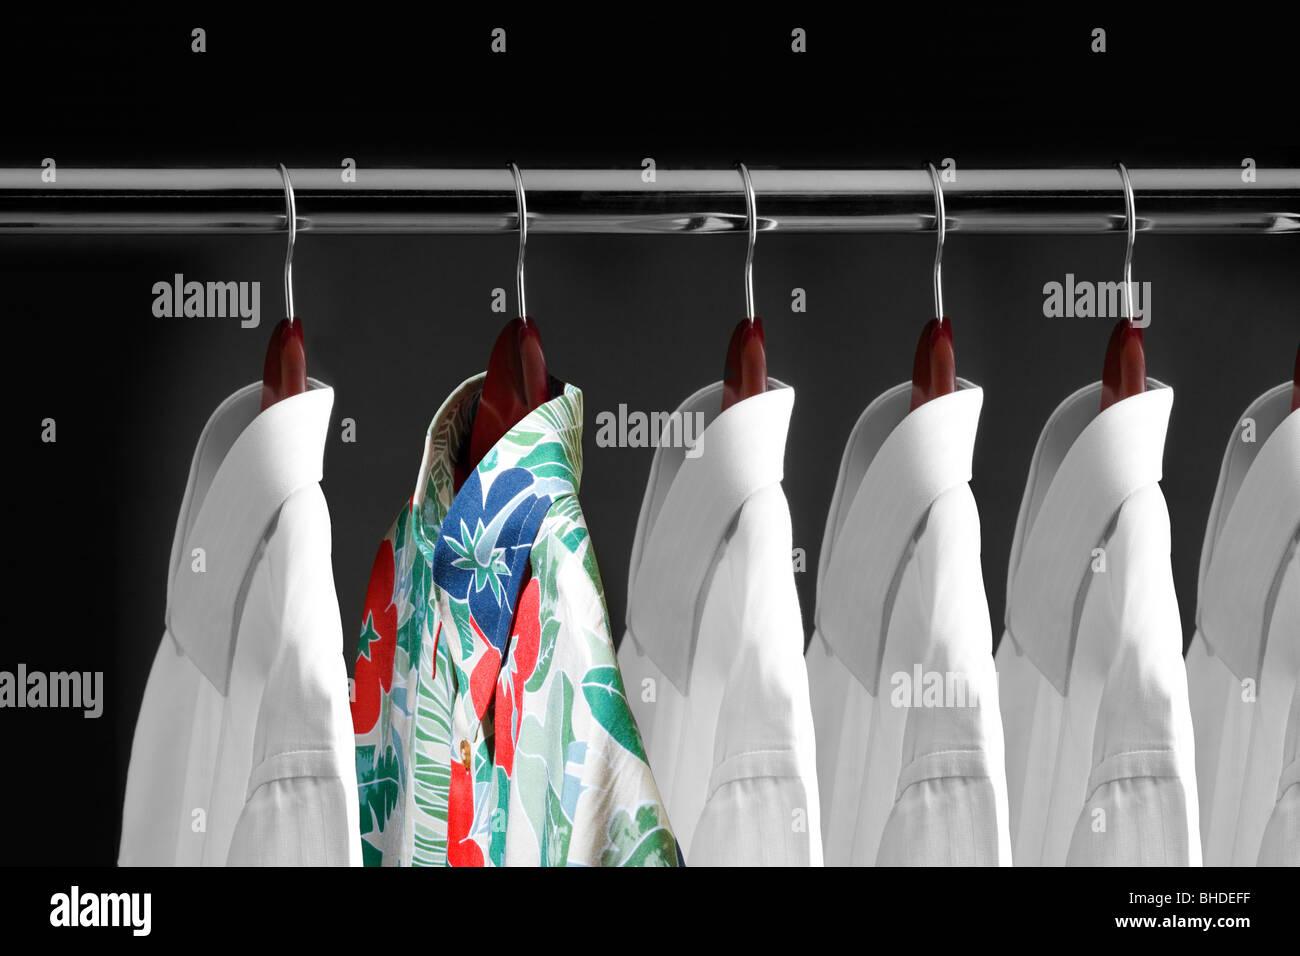 Tropical shirt between white shirts hanging inside a closet - Stock Image